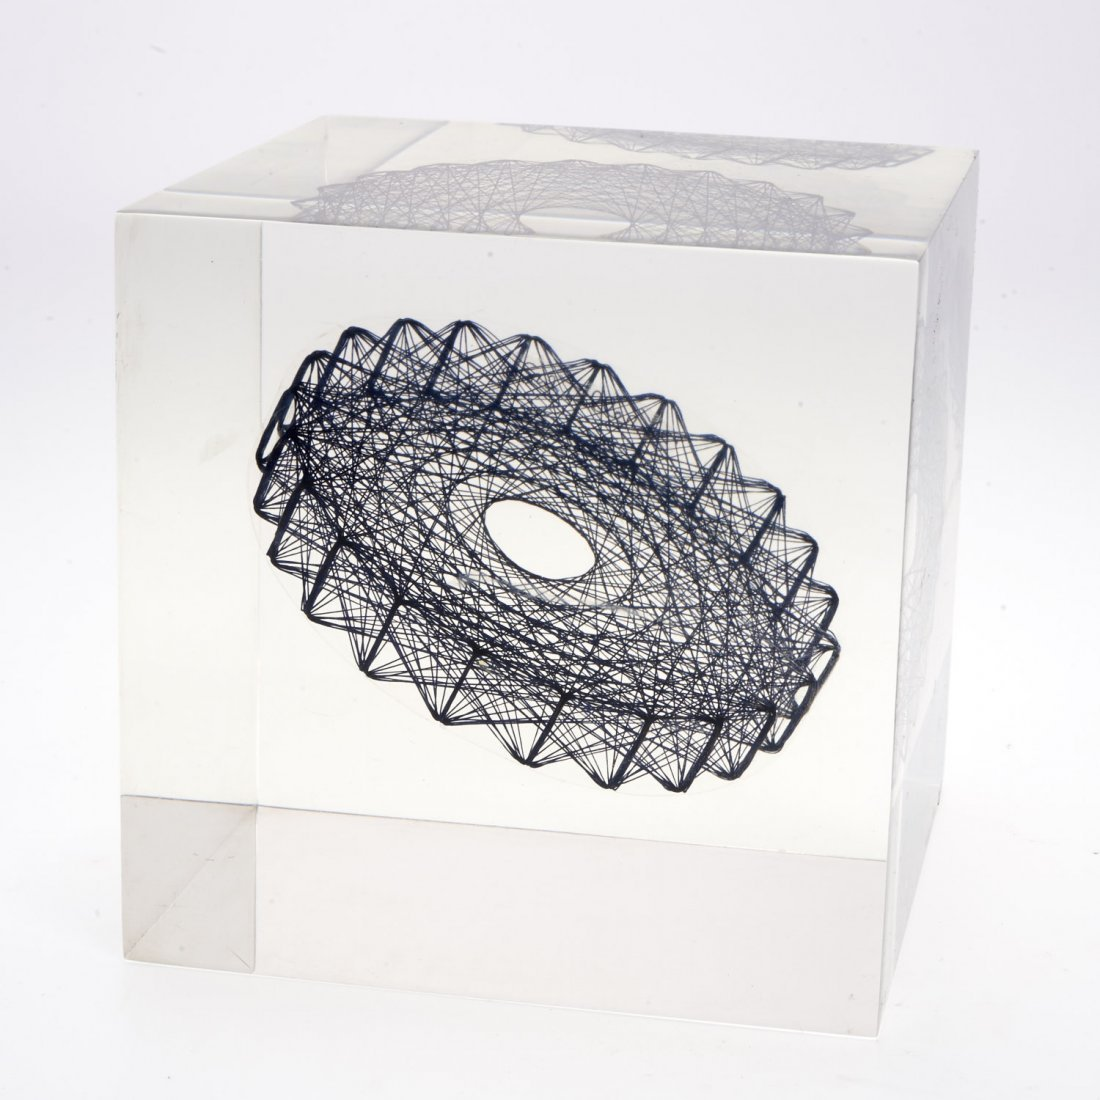 Sue Fuller, acrylic sculpture